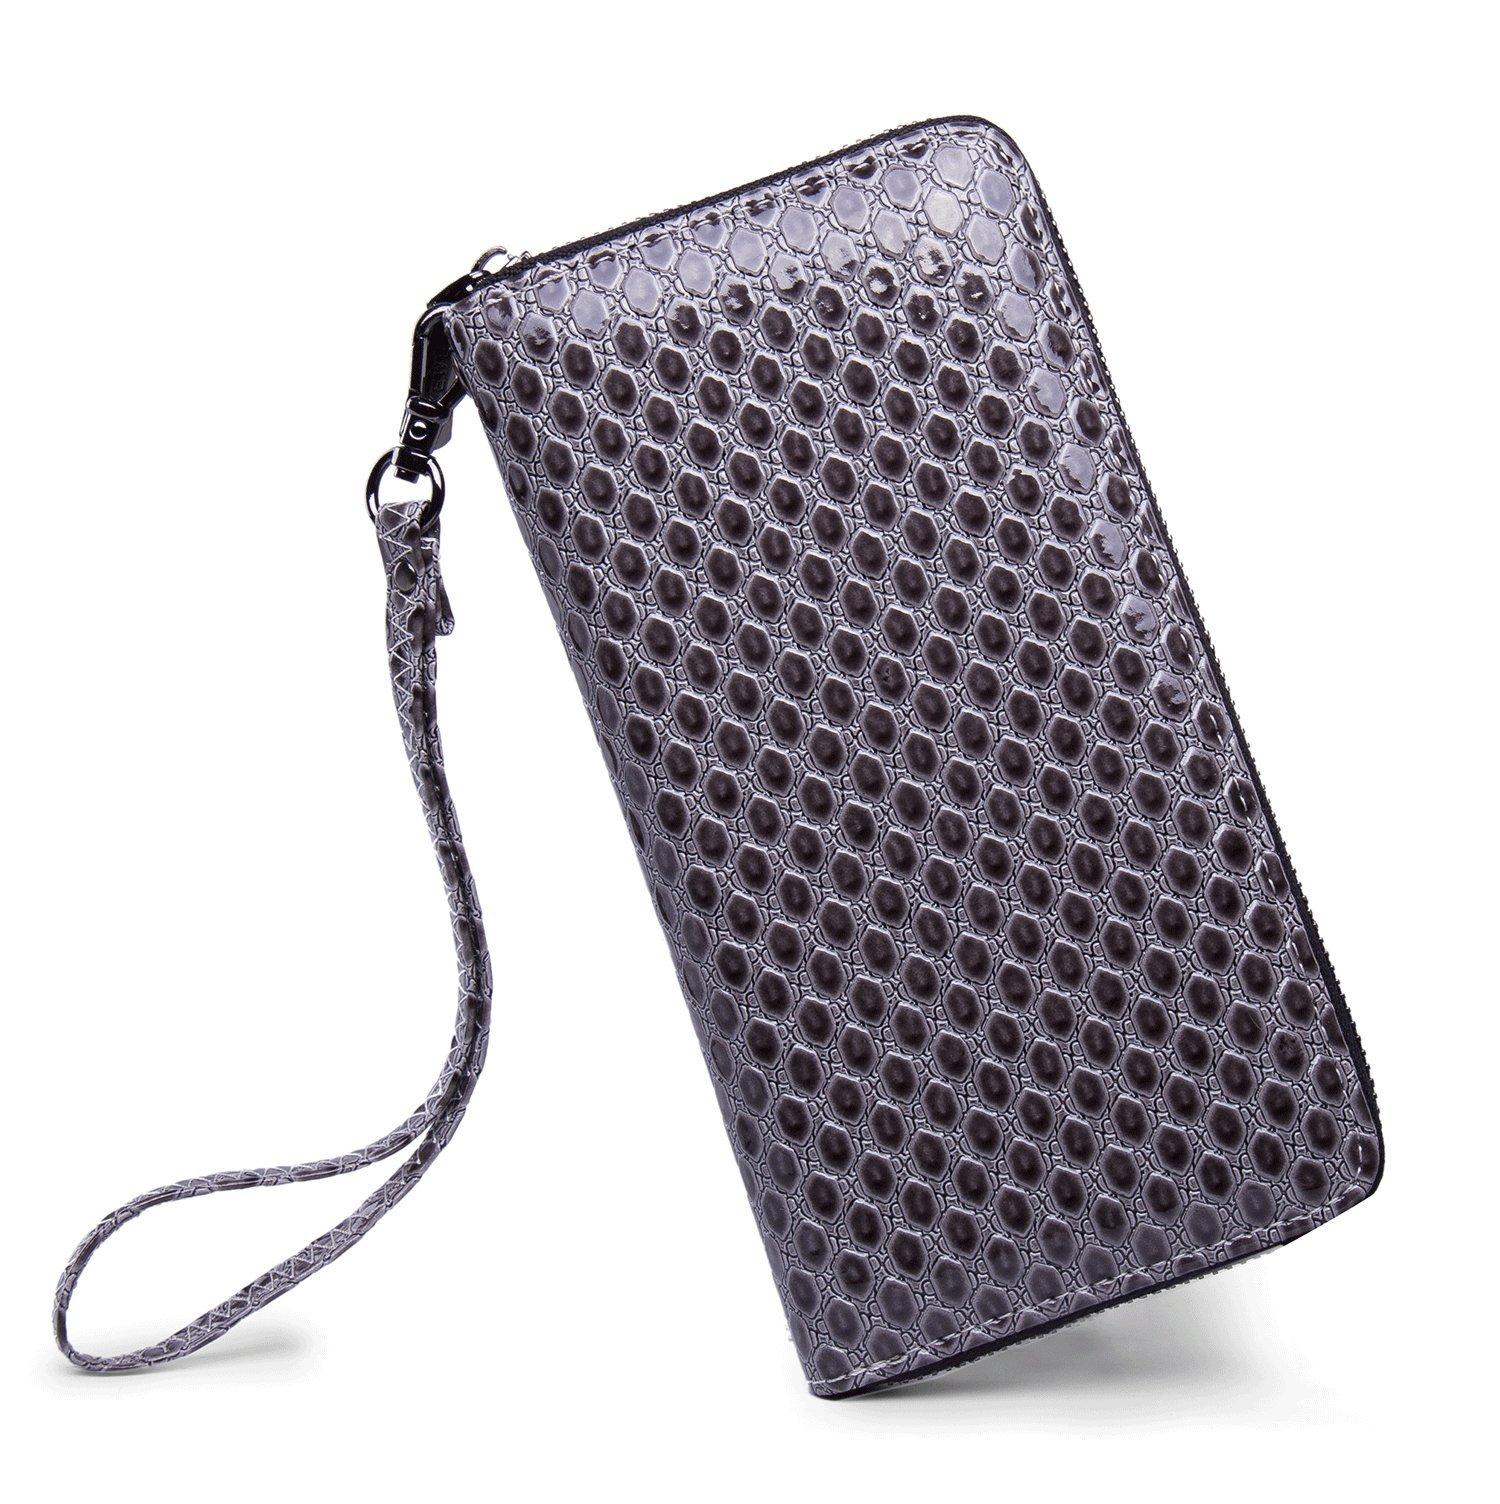 LIKEWE Women Grey Hexagon Wallet Zip Around Clutch Wallet Large Travel Purse (PU-Grey-LBX)